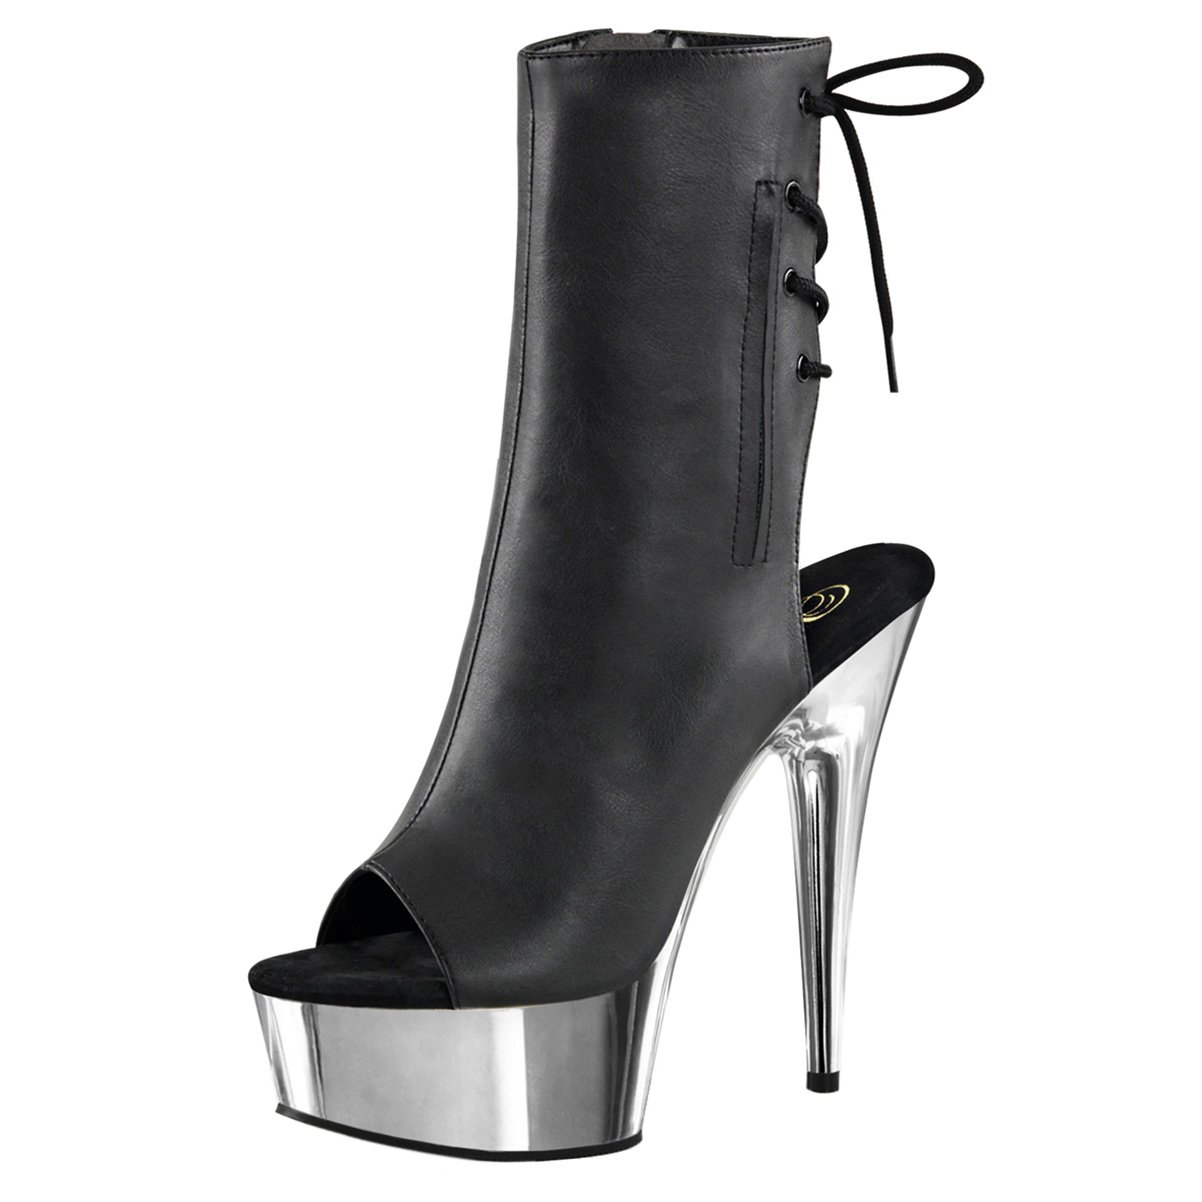 191152088d1 Amazon.com | 6 Inch High Heel Platform Sexy Boots Lace Up Back Peep ...